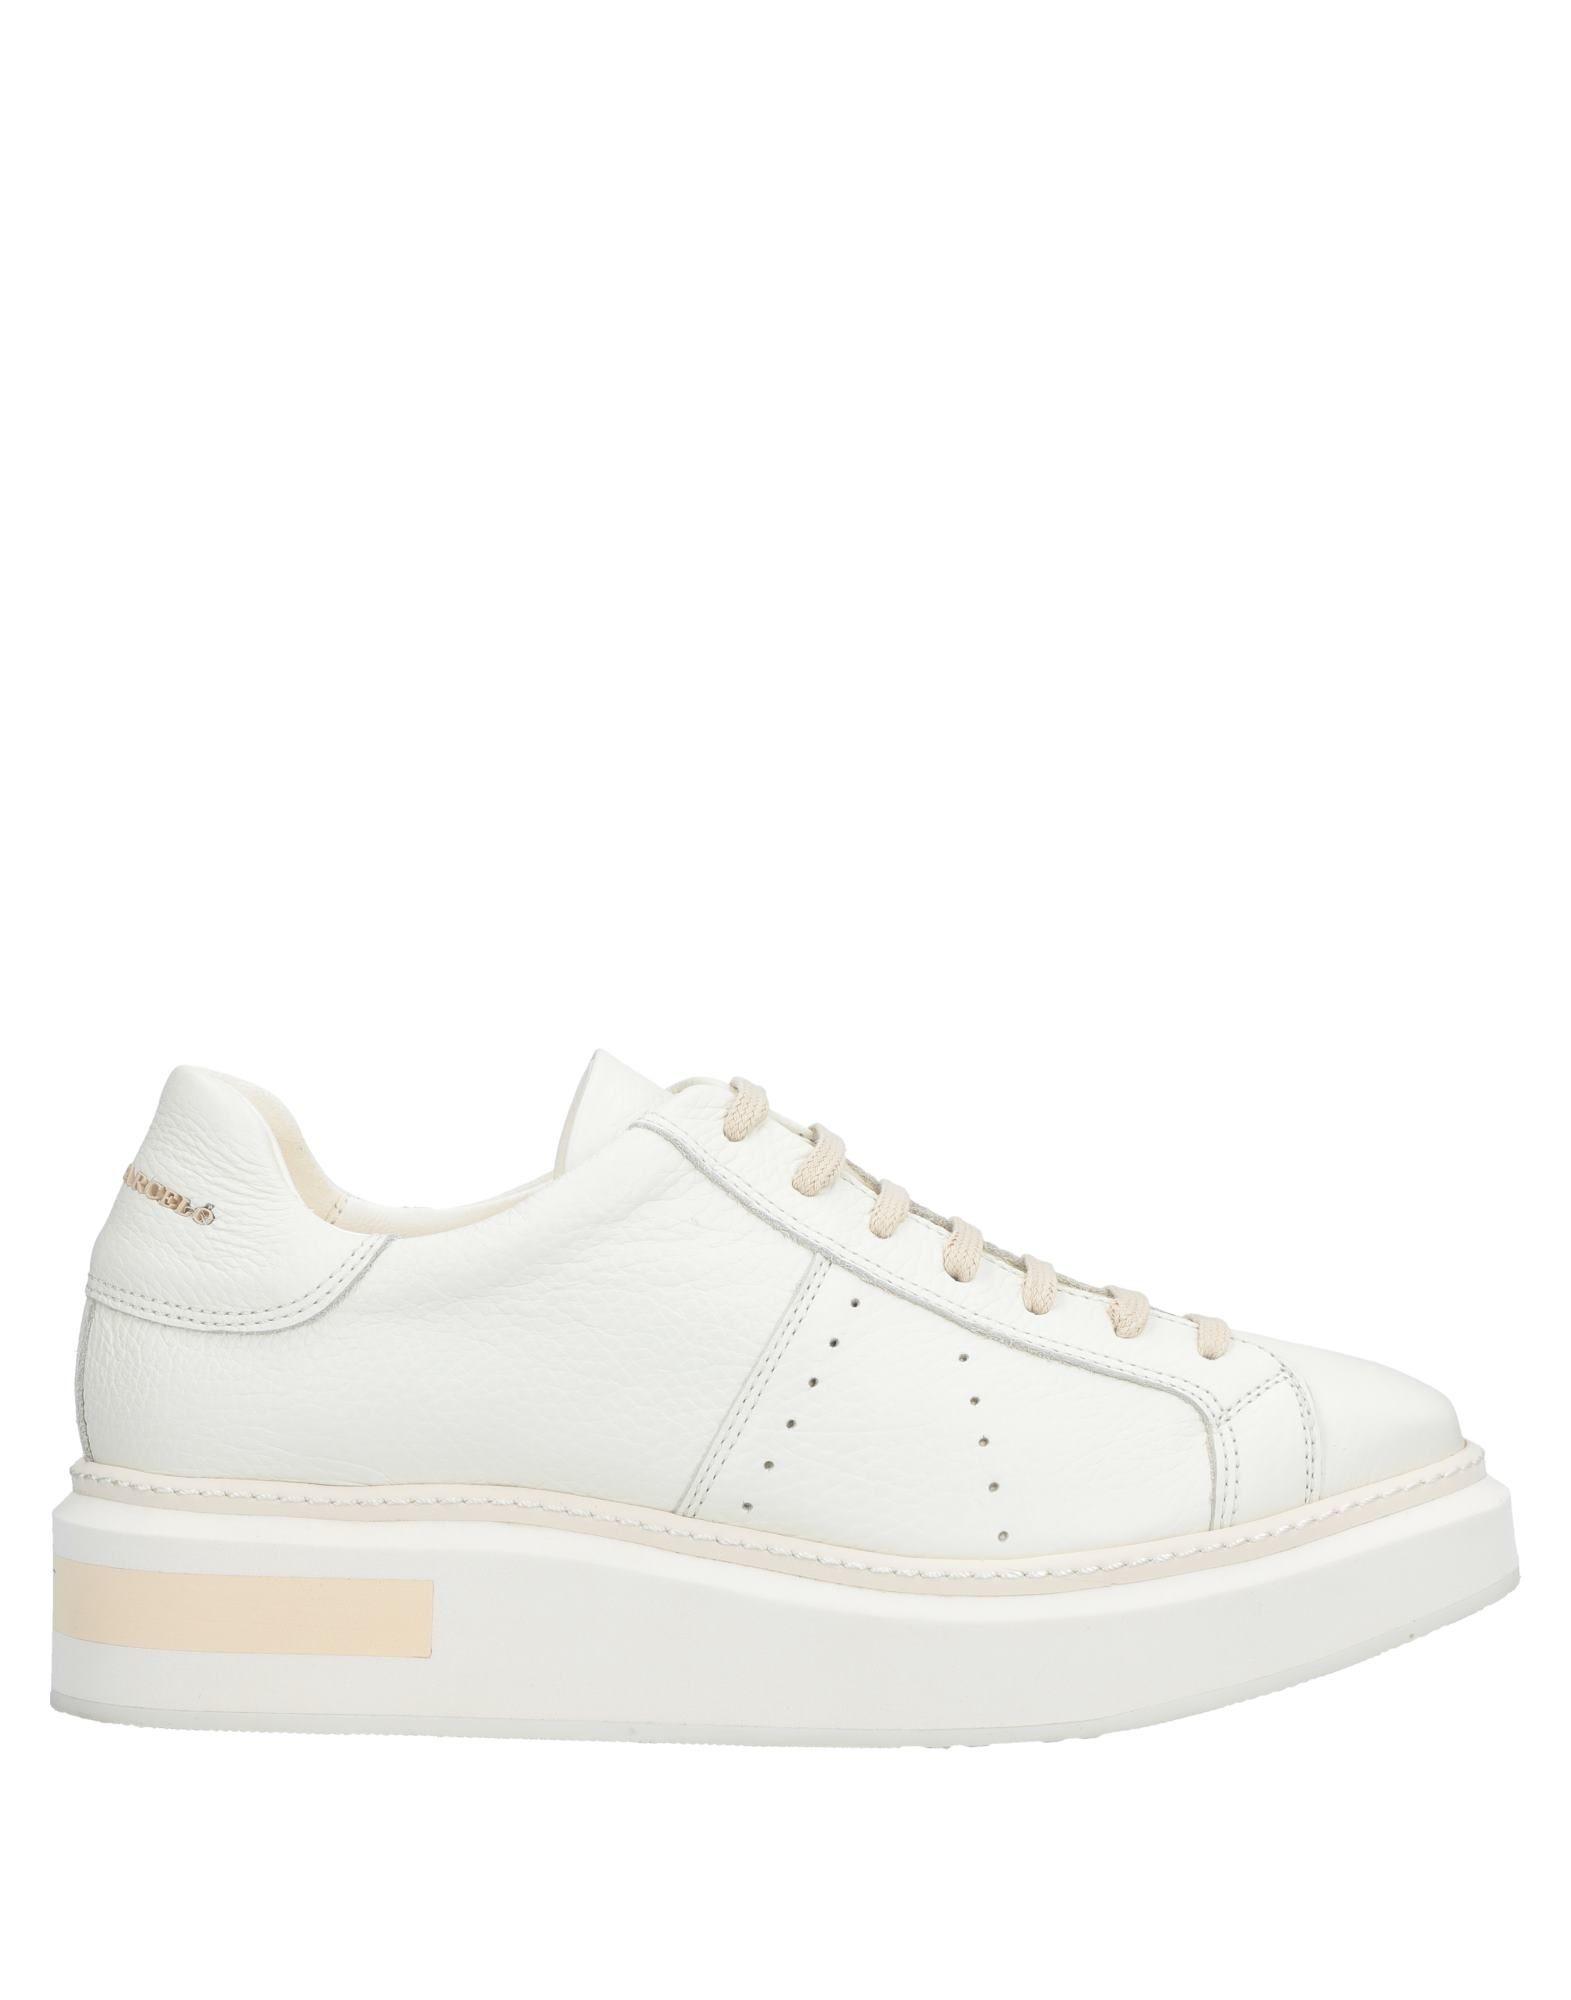 Stilvolle billige Schuhe Manuel Barceló Sneakers Damen  11536243KI